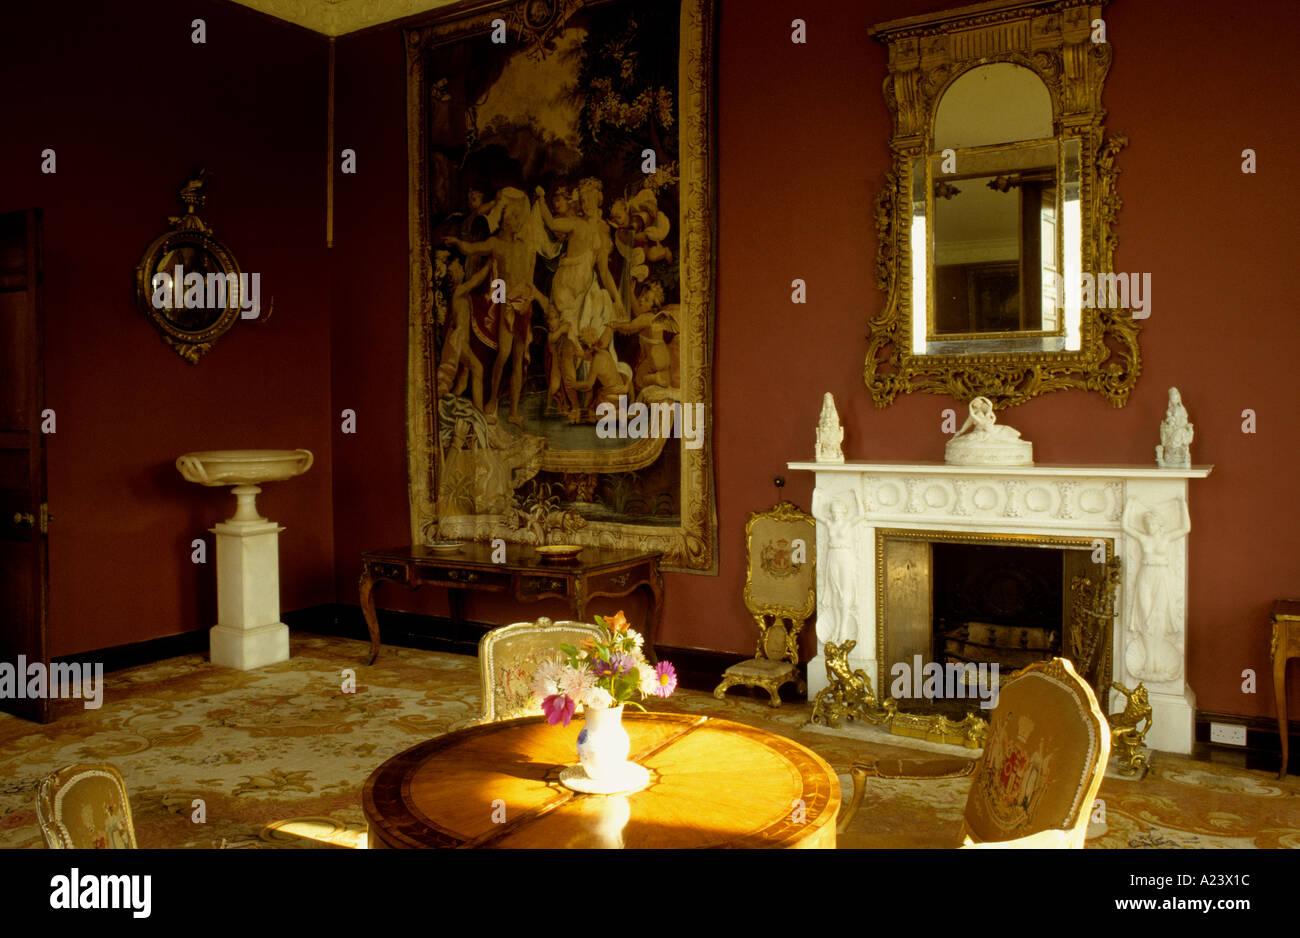 bantry house interior co cork ireland stock photo, royalty free